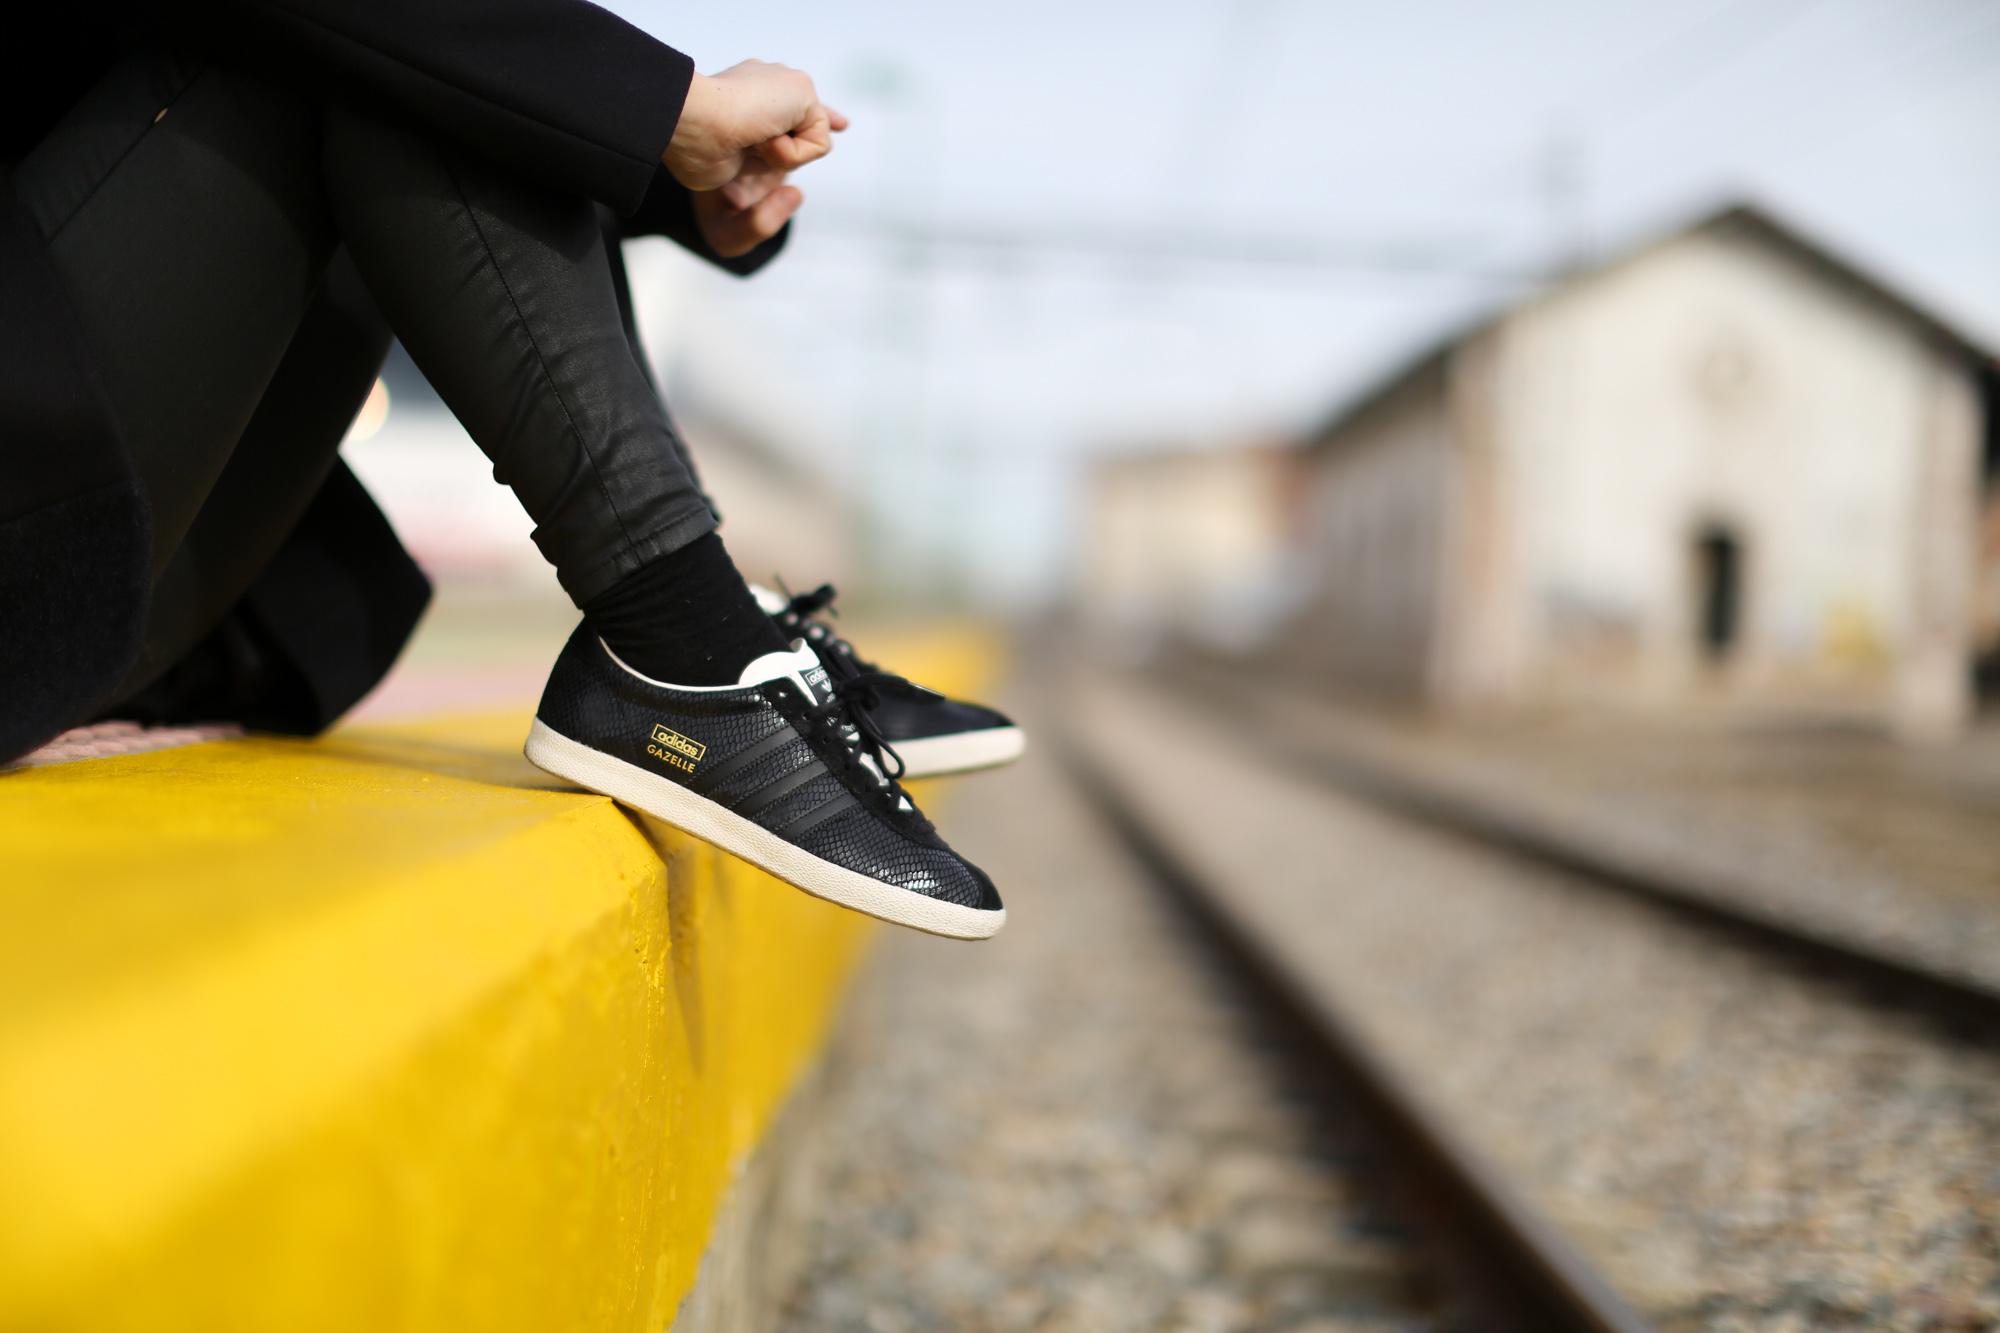 Clochet_streetstyle_cos_coat_saint_james_hat_adidas_gazelle-1-12